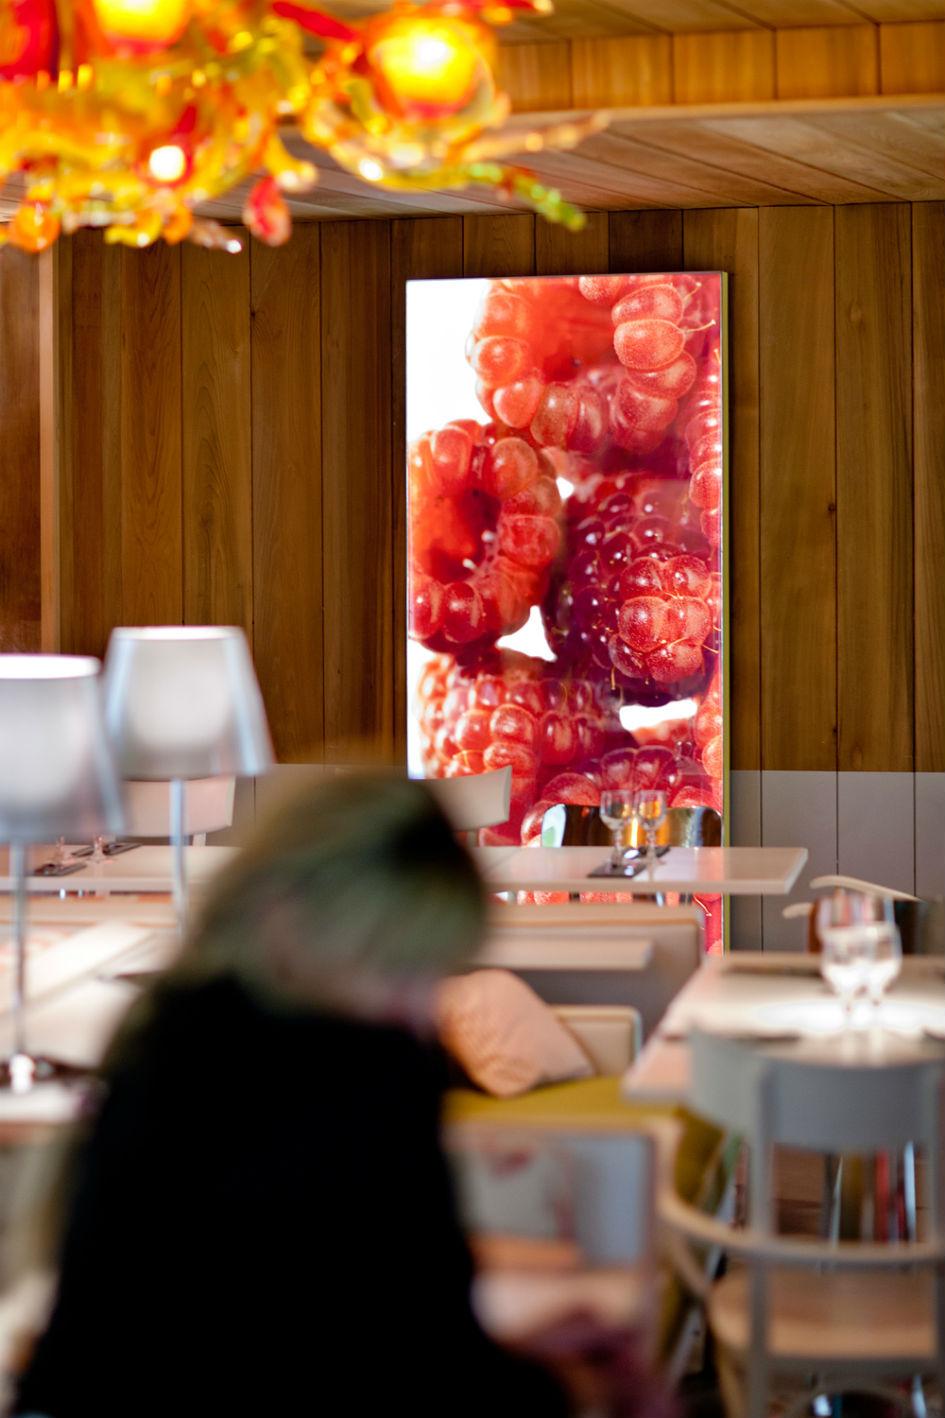 Paradis Du Fruit By Philippe Starck (4) Paradis Du Fruit By Philippe Starck Paradis Du Fruit By Philippe Starck Paradis Du Fruit By Philippe Starck 4